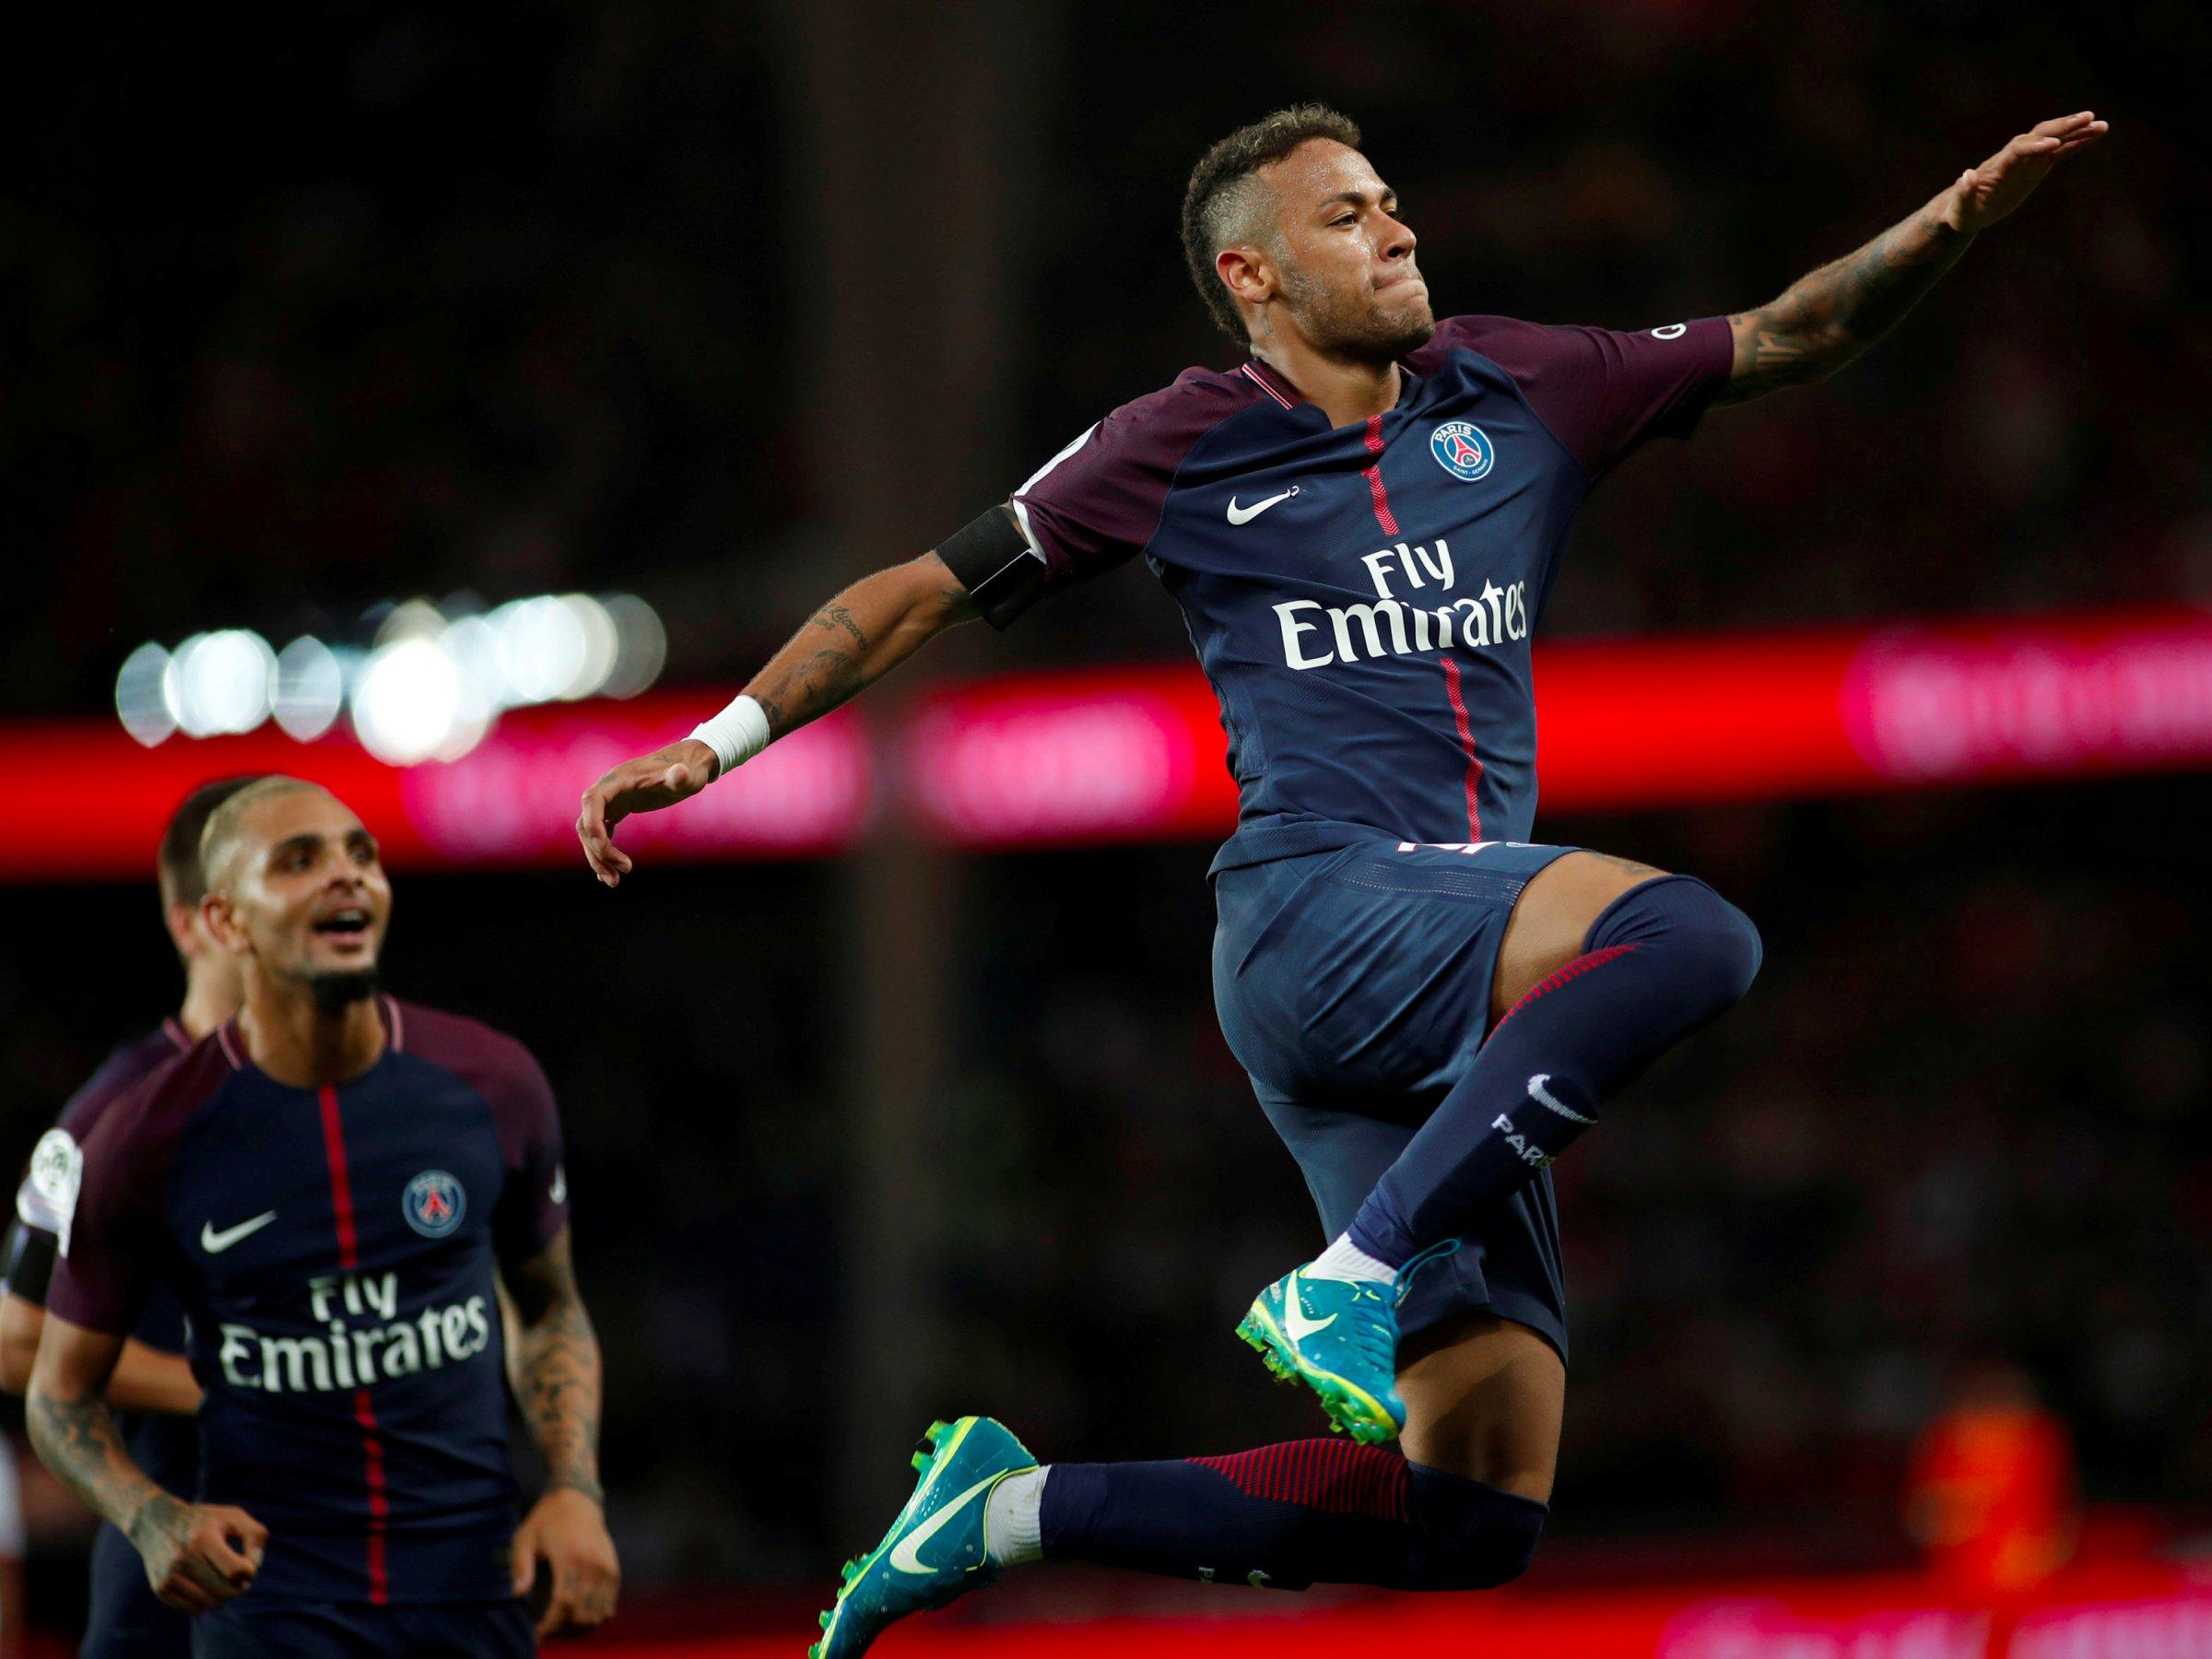 Neymar had an outrageous PSG home debut   Business Insider 2400x1800